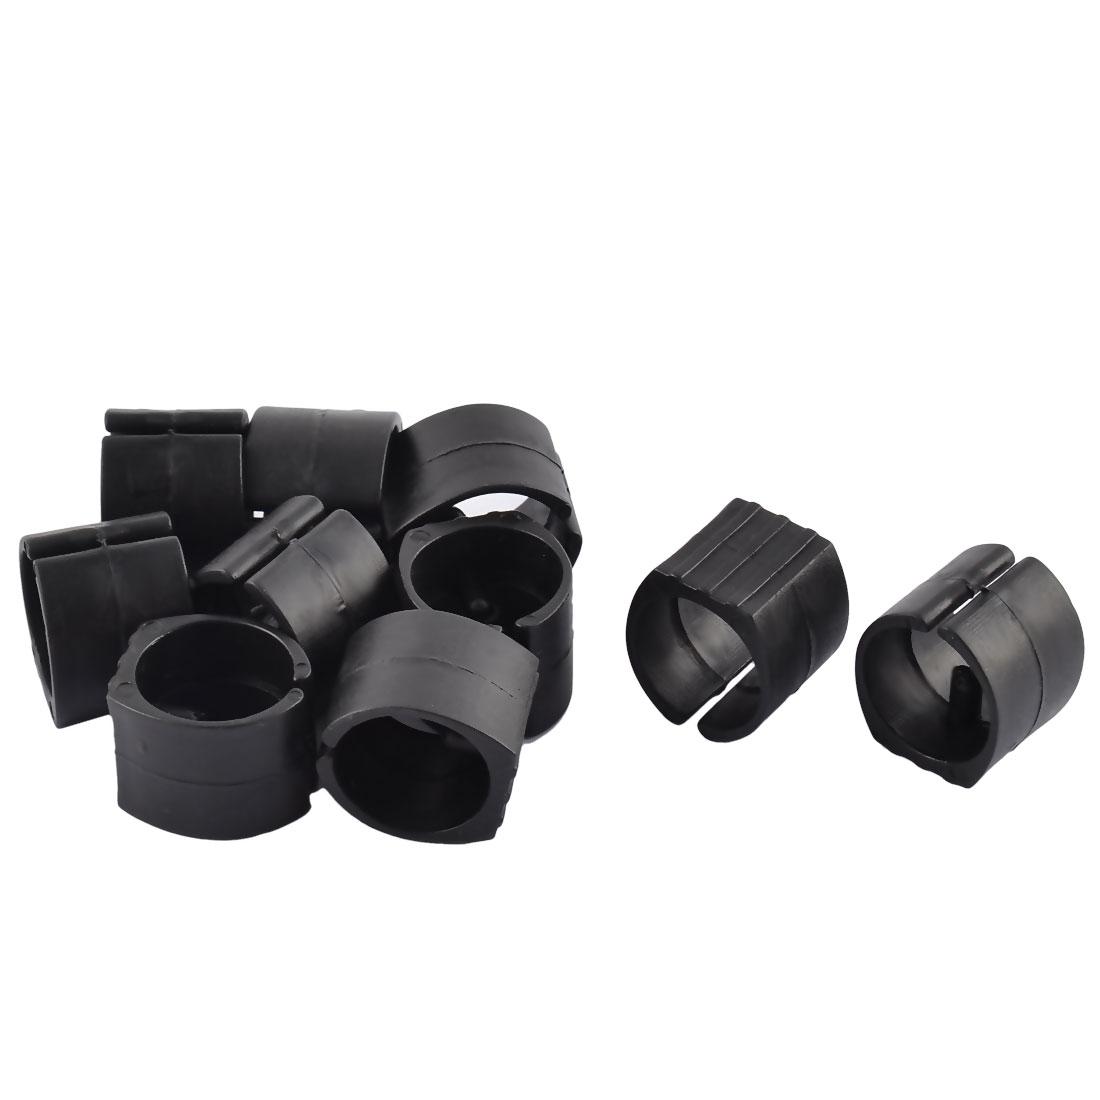 20mm Dia Non-slip Chair Pipe Foot Clamp Pads Floor Glides U-Shaped Caps Black 10pcs